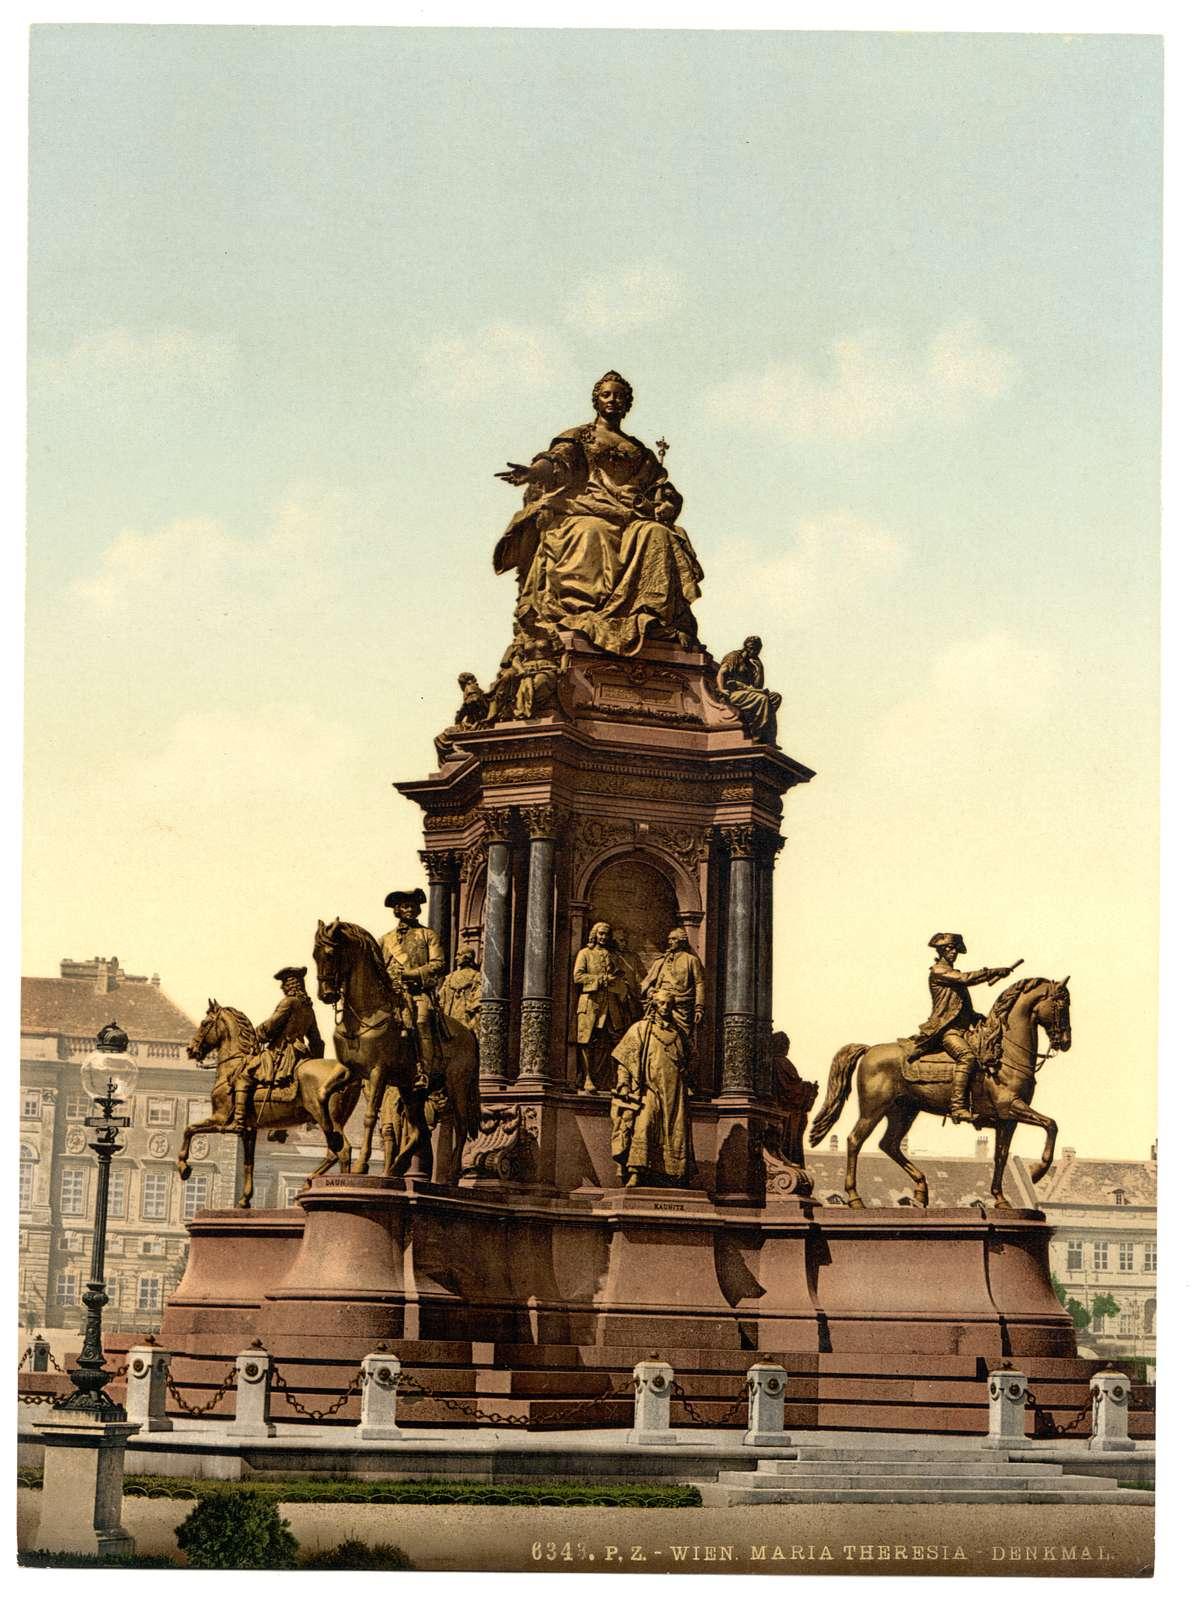 [Maria Theresa Monument, Vienna, Austro-Hungary]